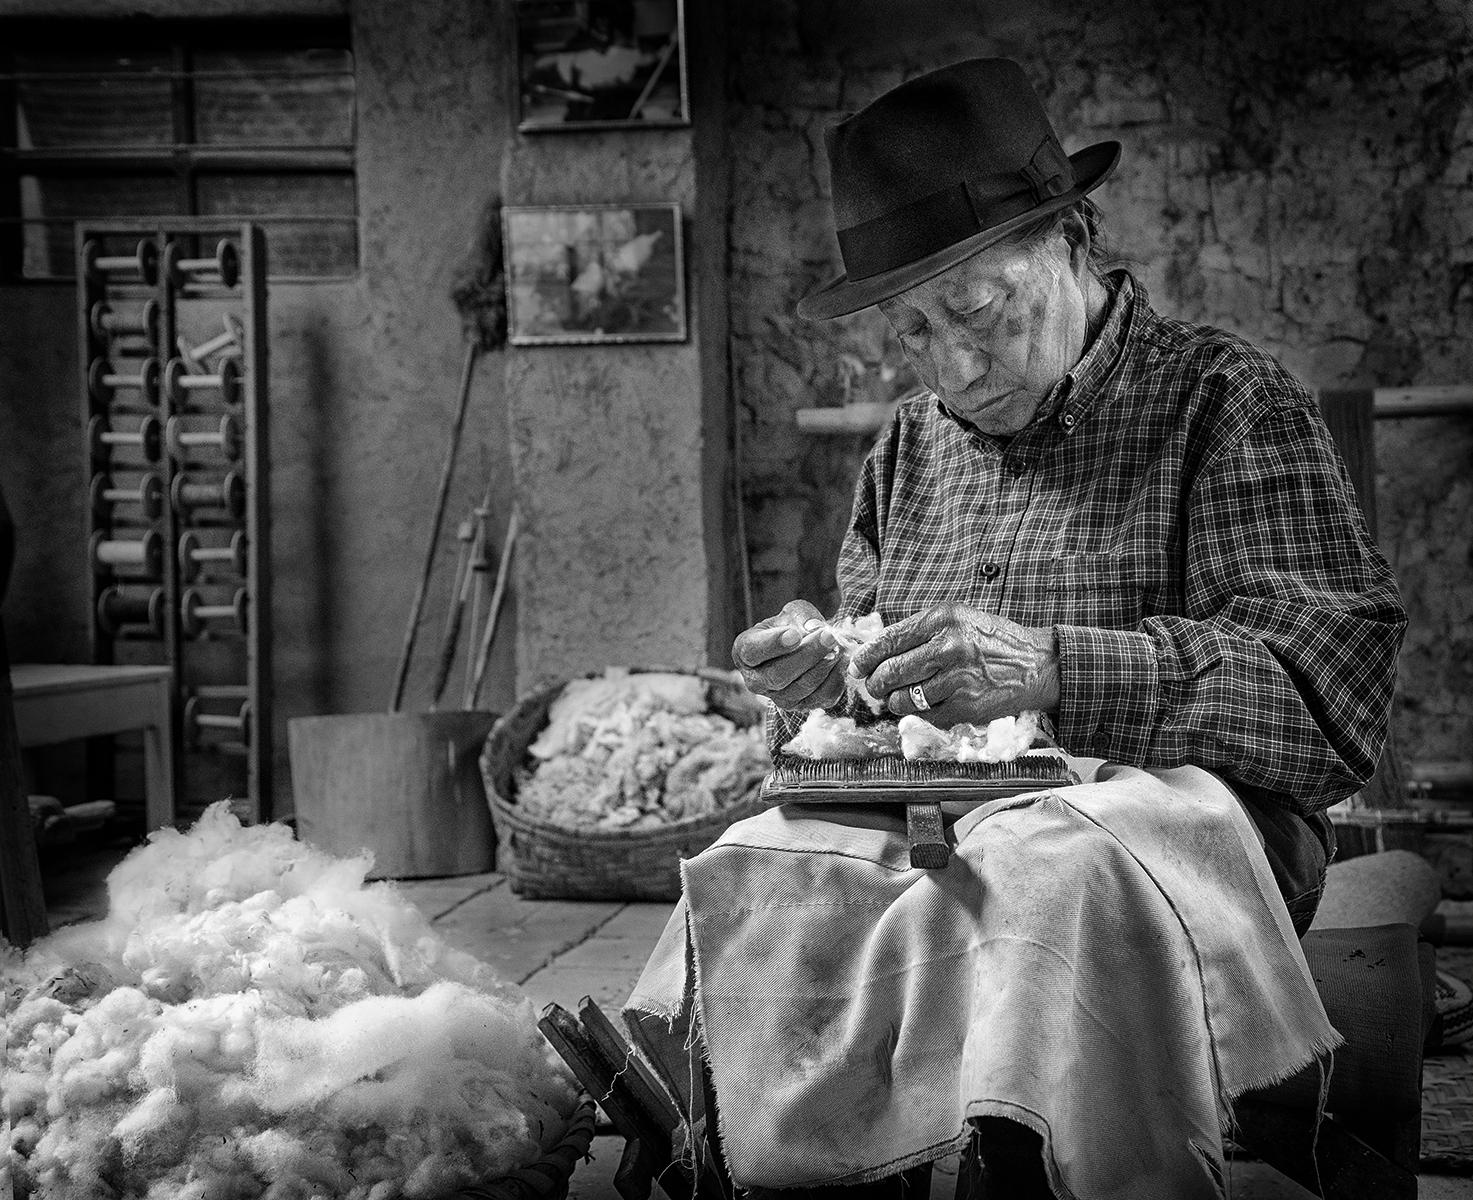 Don miguel carding alpaca wool